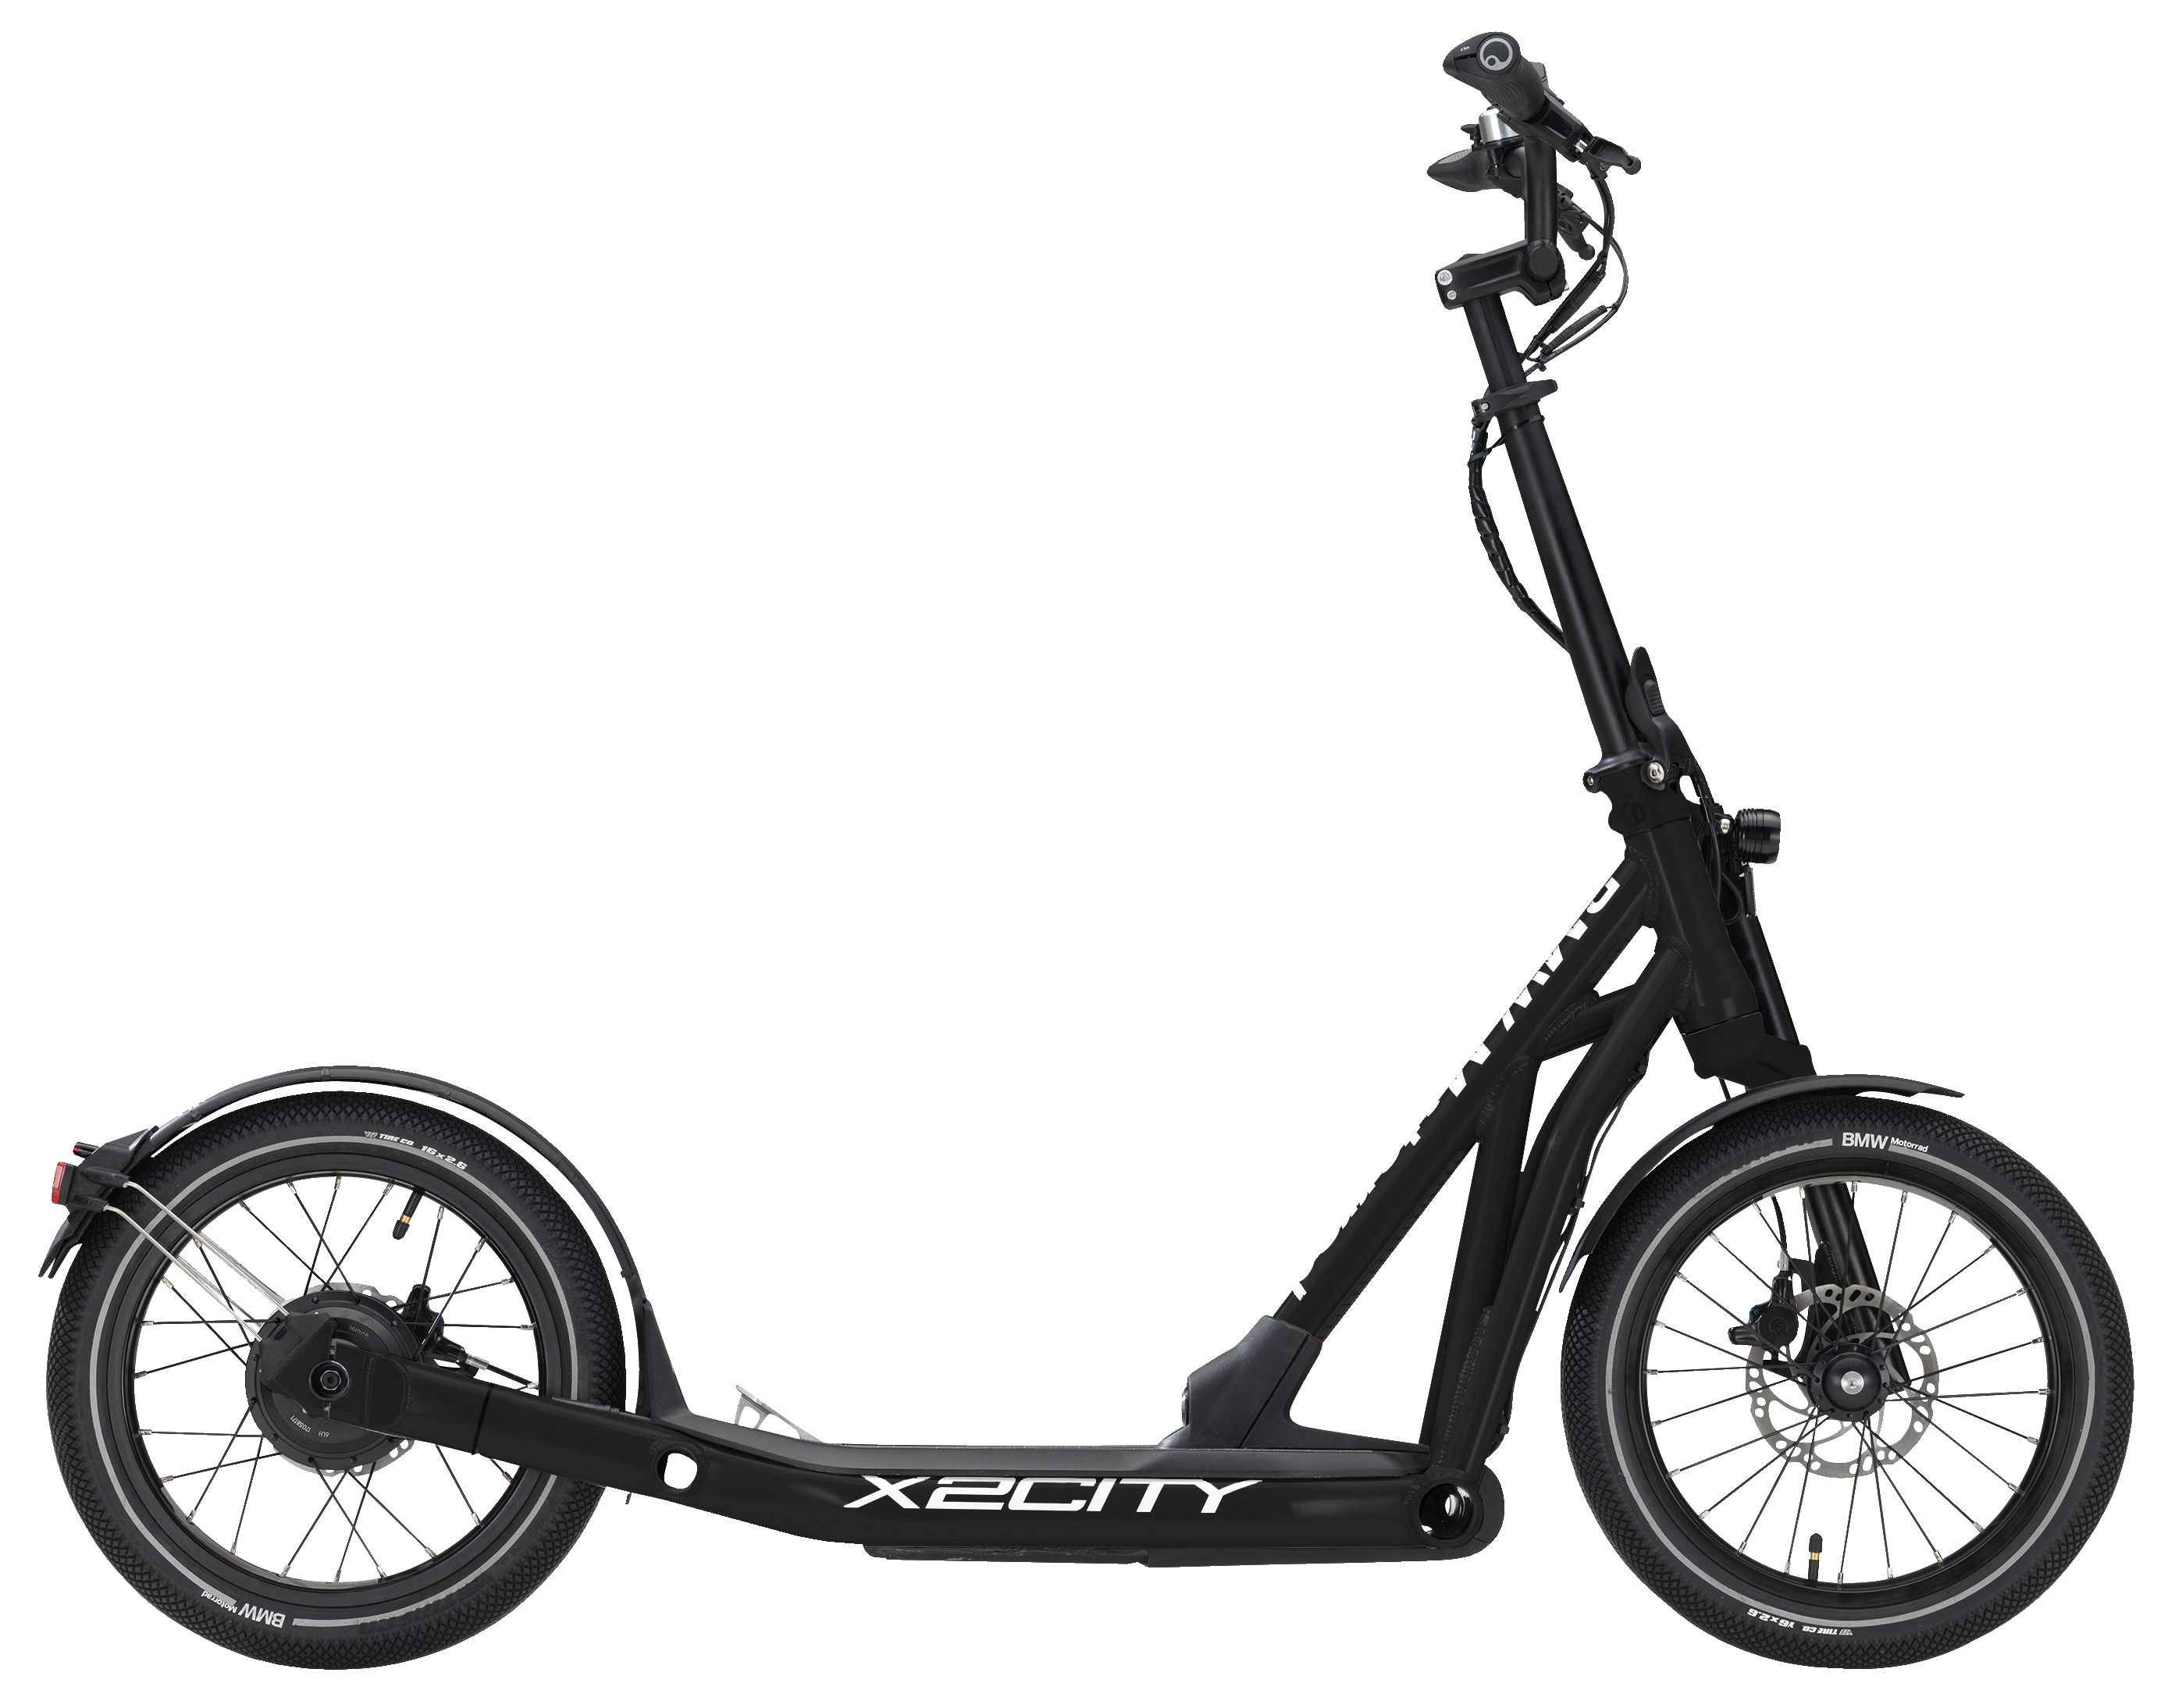 E Roller X2city Bmw Hat Den Ersten Legalen E Scooter Für